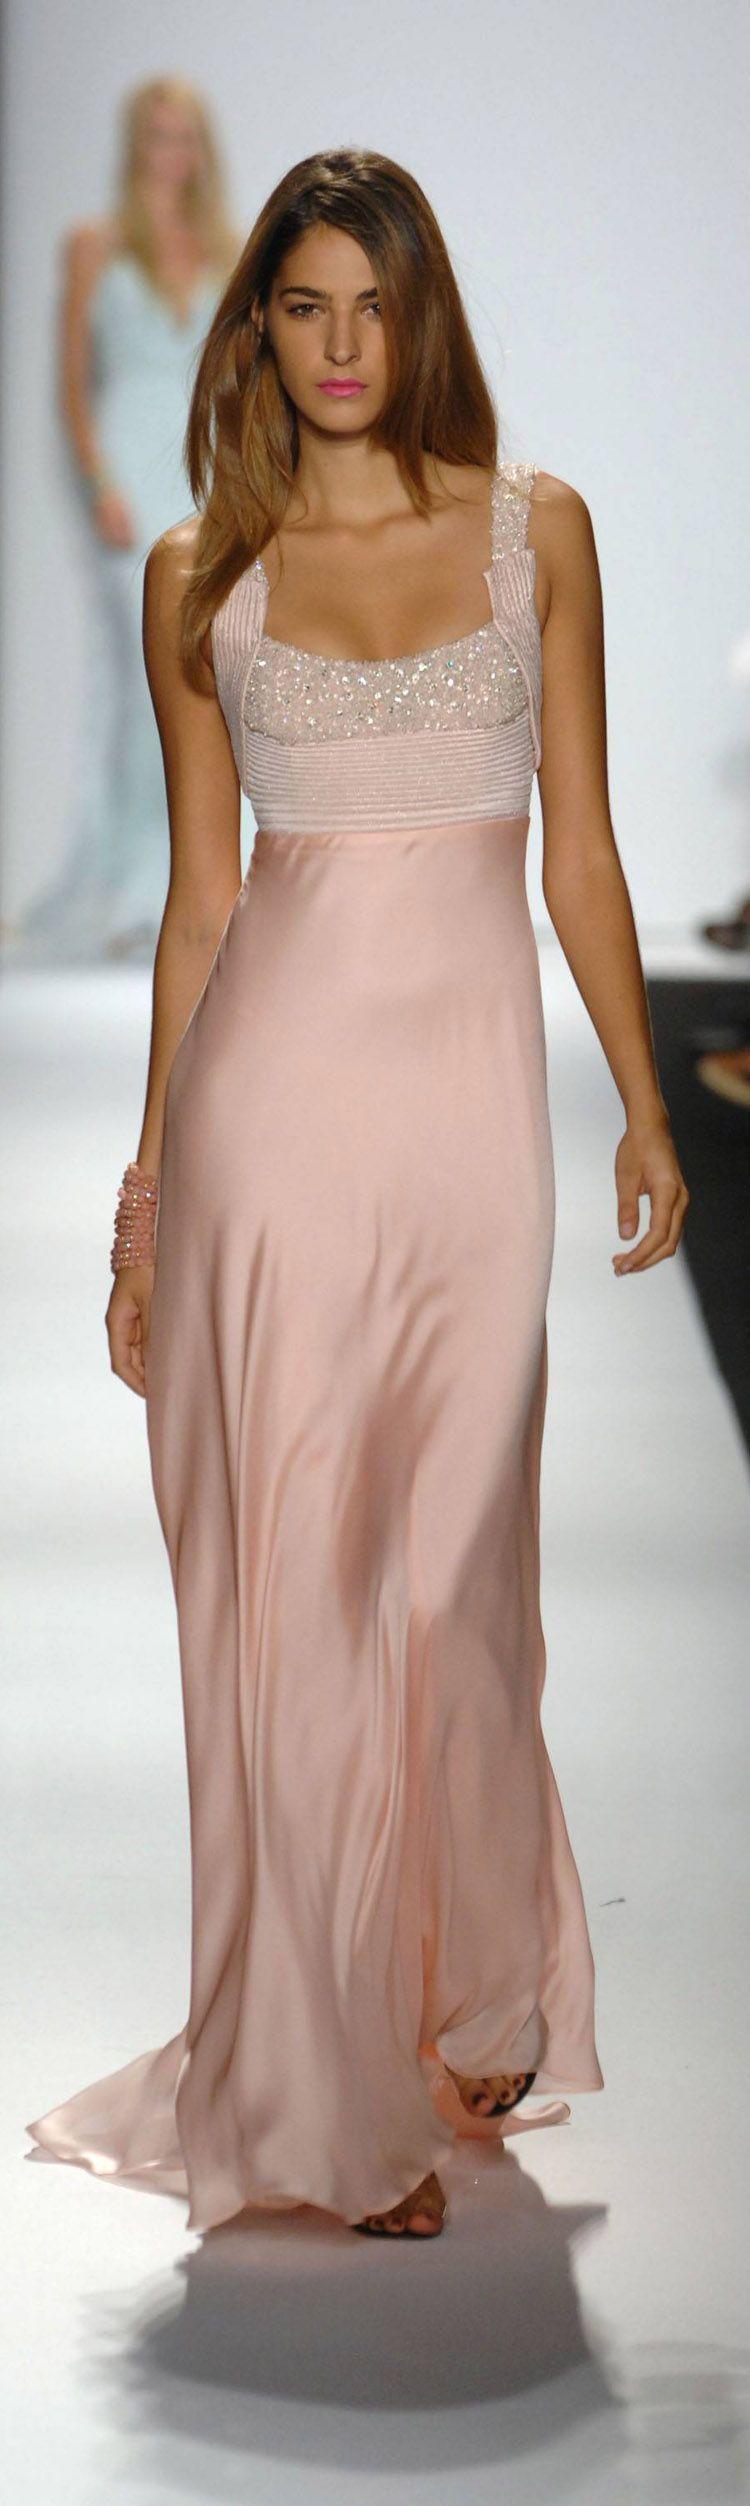 Gorgeous http://www.honeybrides.co.uk/99-prom-dresses?p=2 | Blushing ...